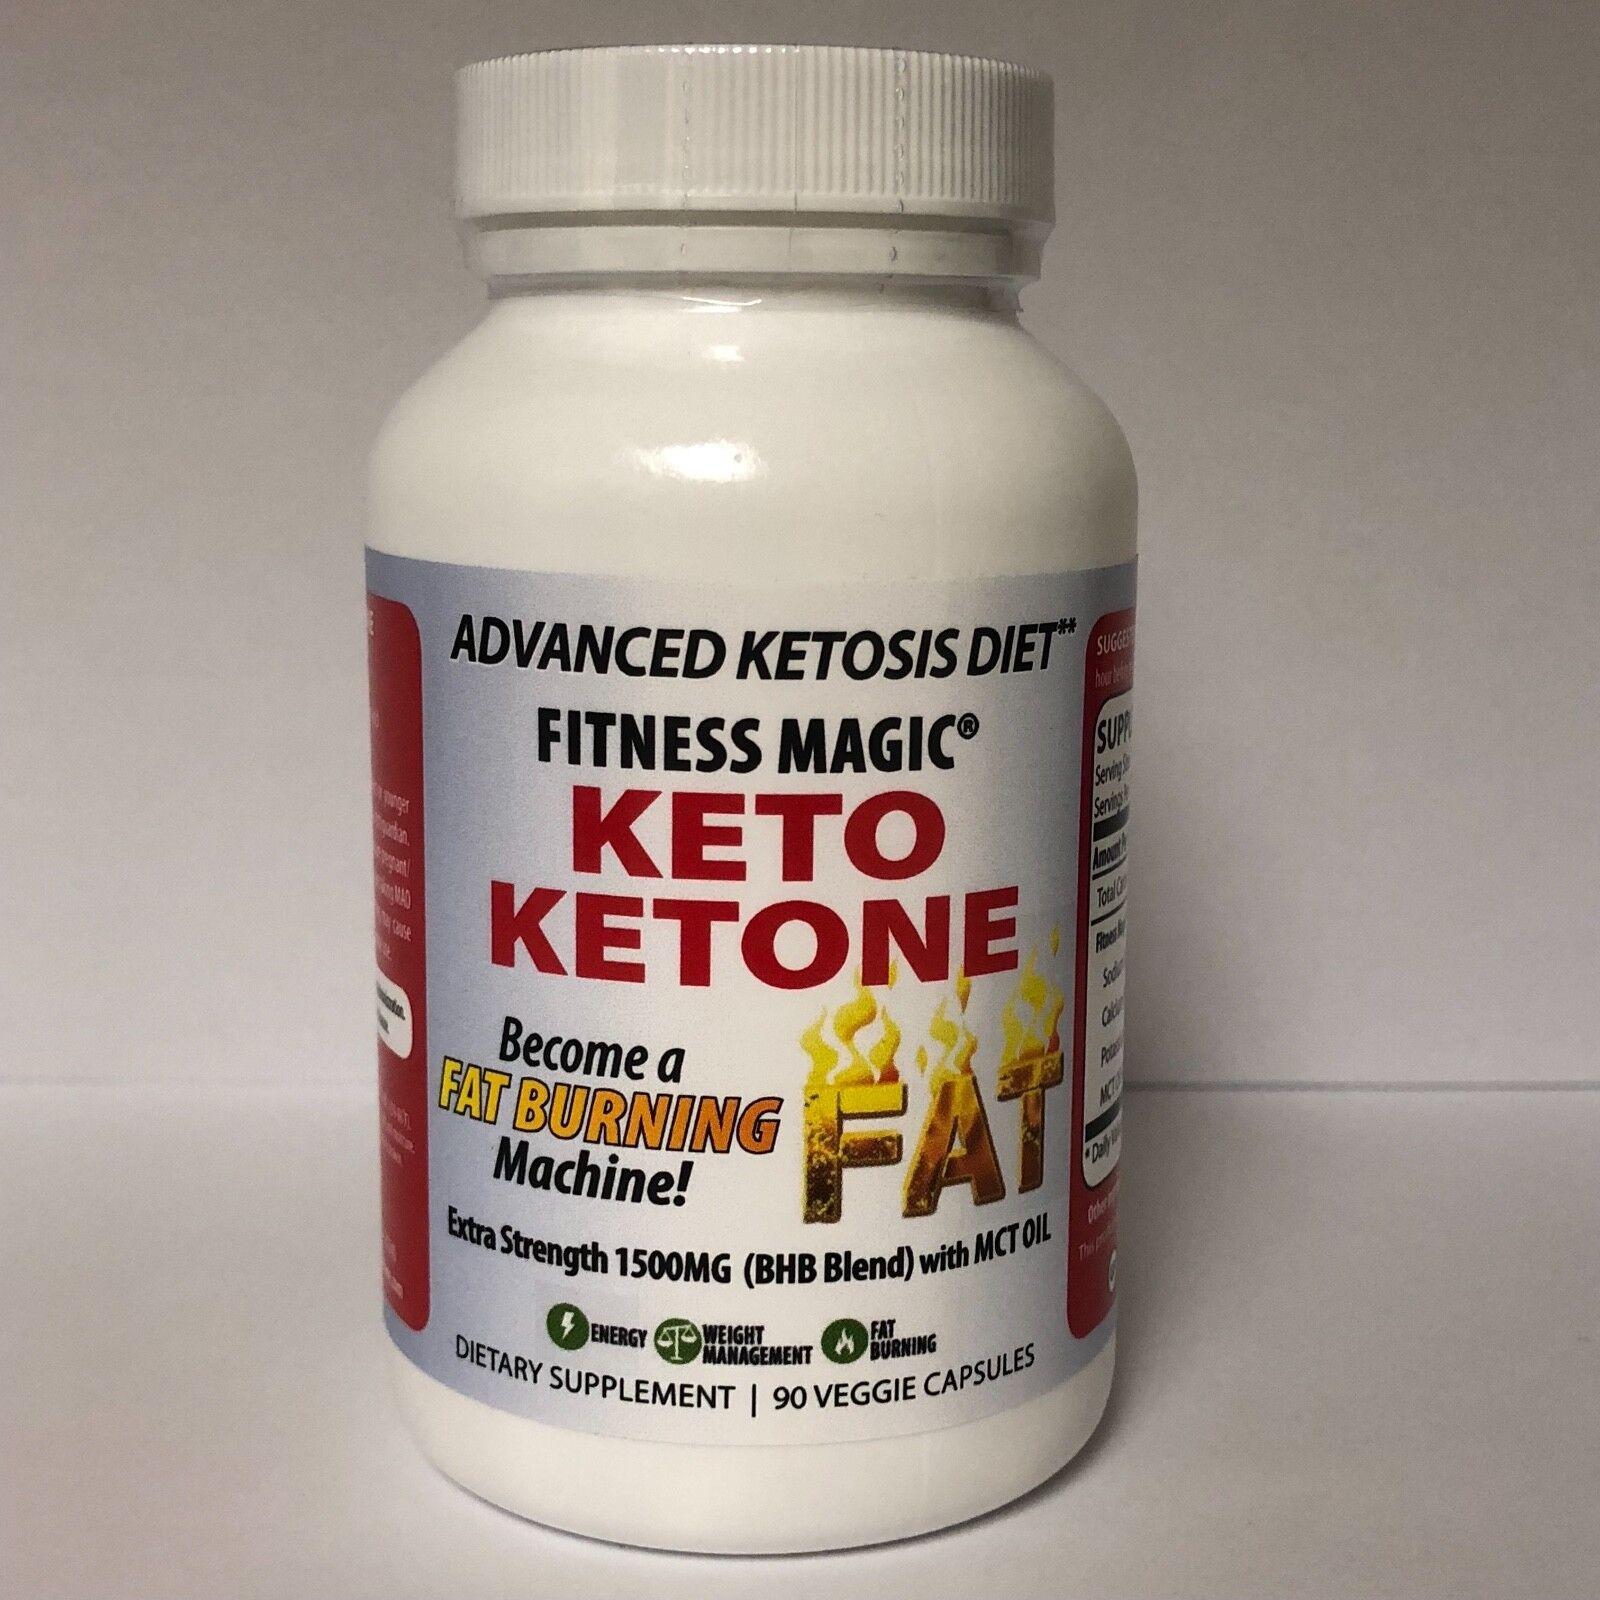 Keto Ketone 90 Veg-Caps - Become a Fat Burning Machine - 150